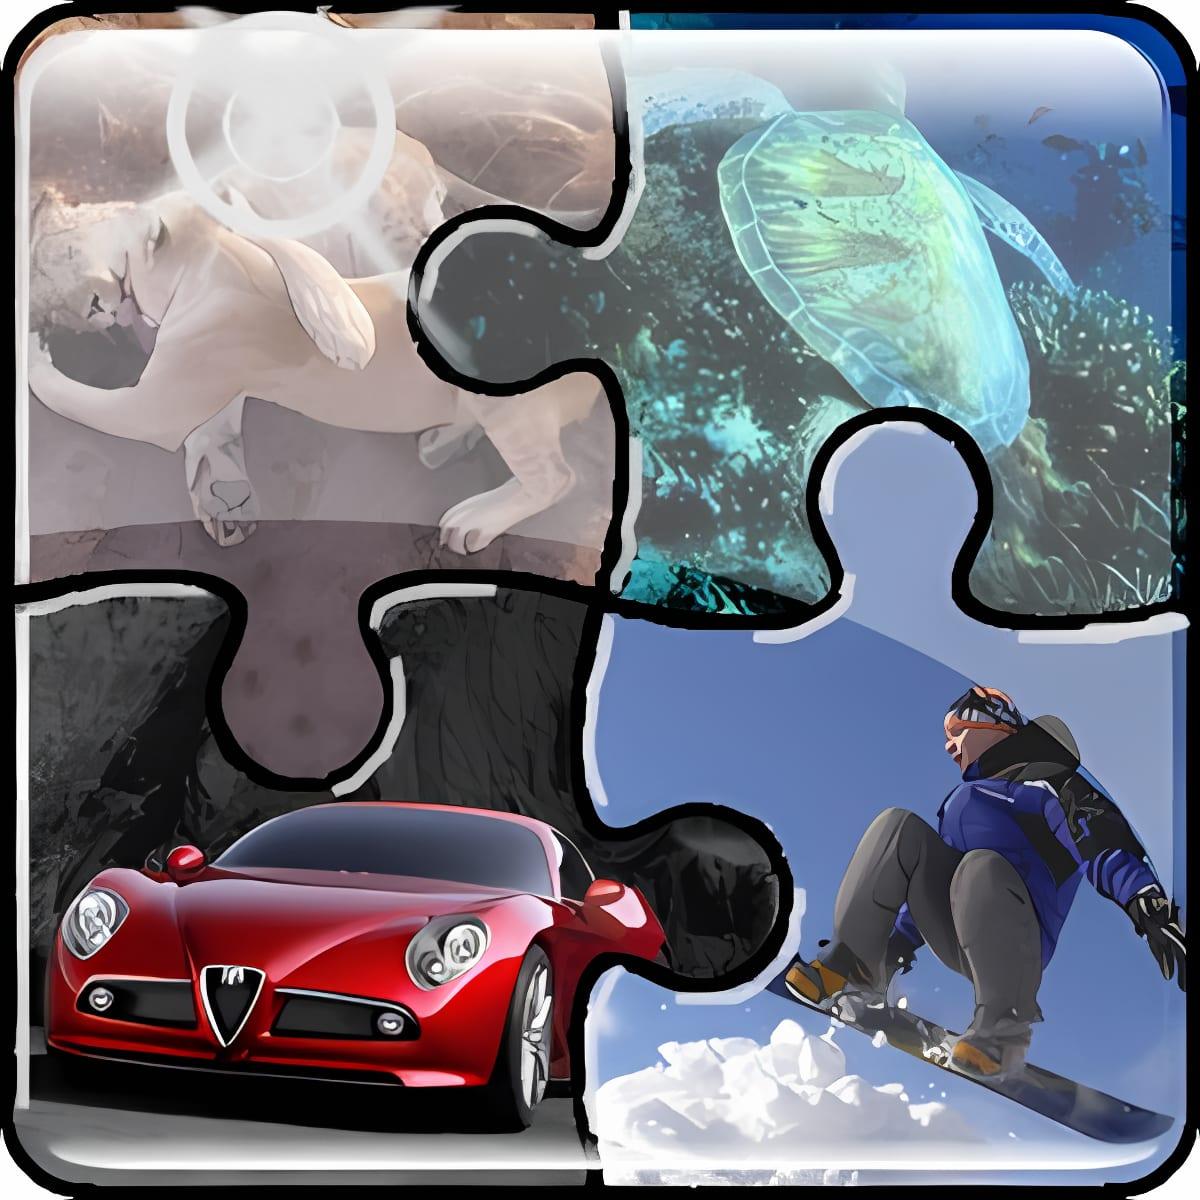 Rompecabezas Jigsaw gratis